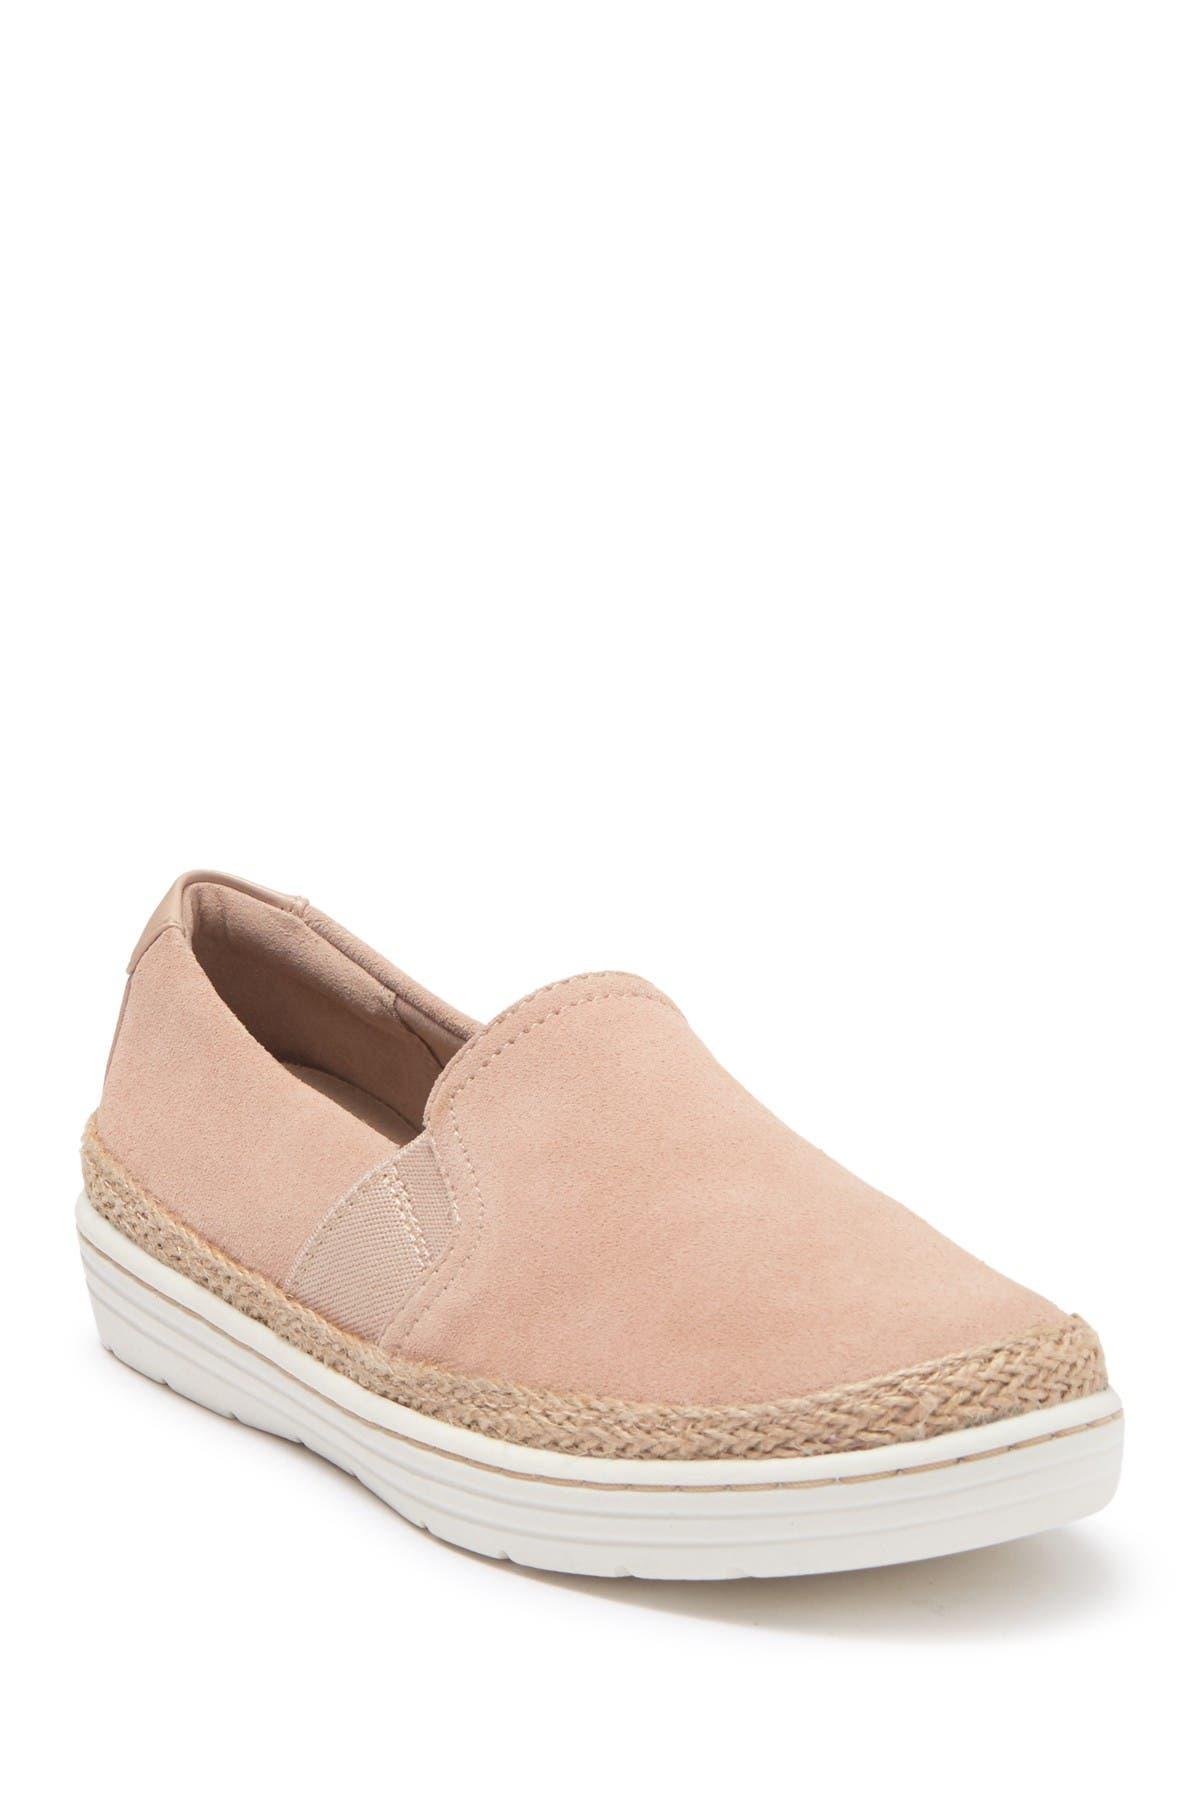 Clarks | Marie Sail Espadrille Sneaker